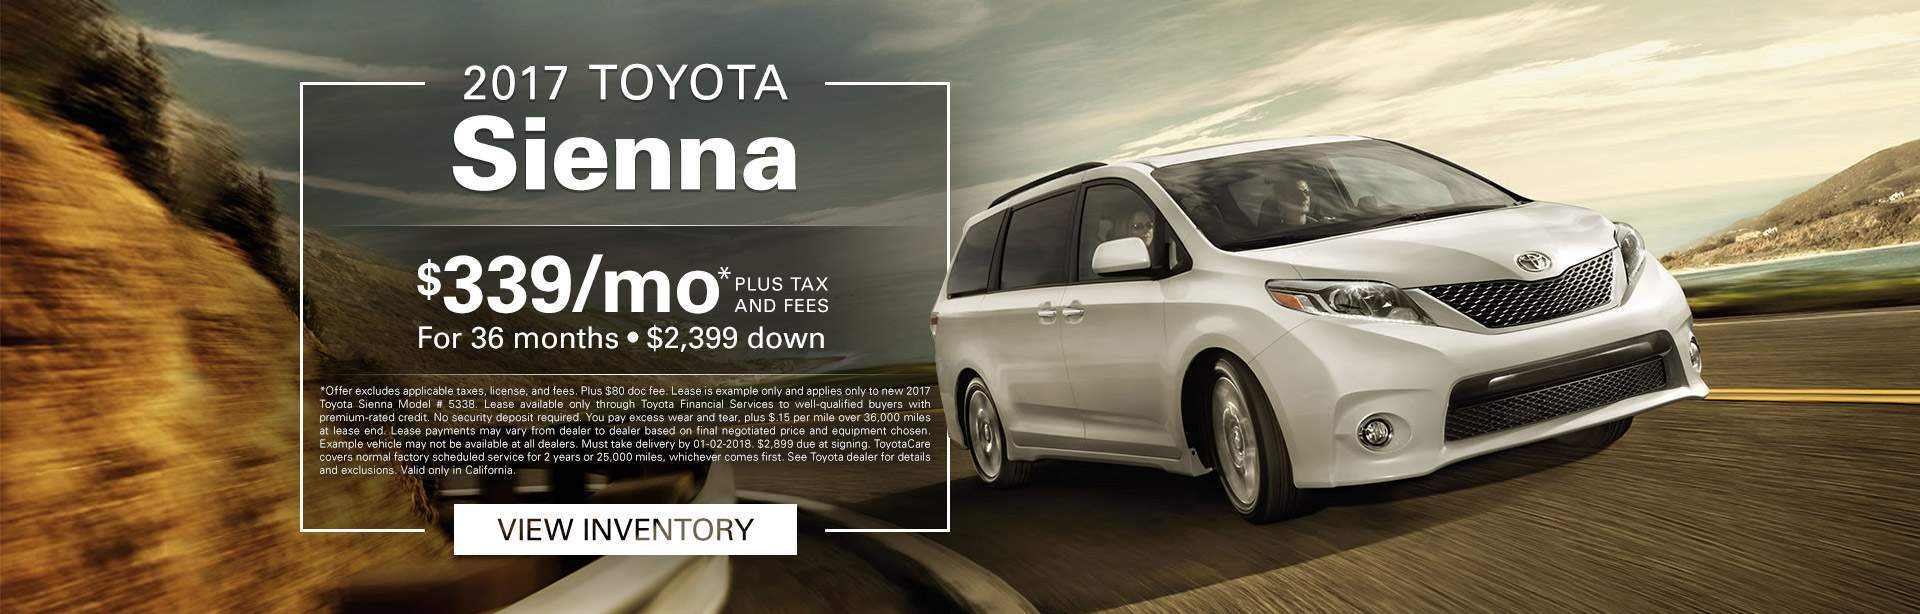 100 Shore Toyota New Toyota Dealership New U0026